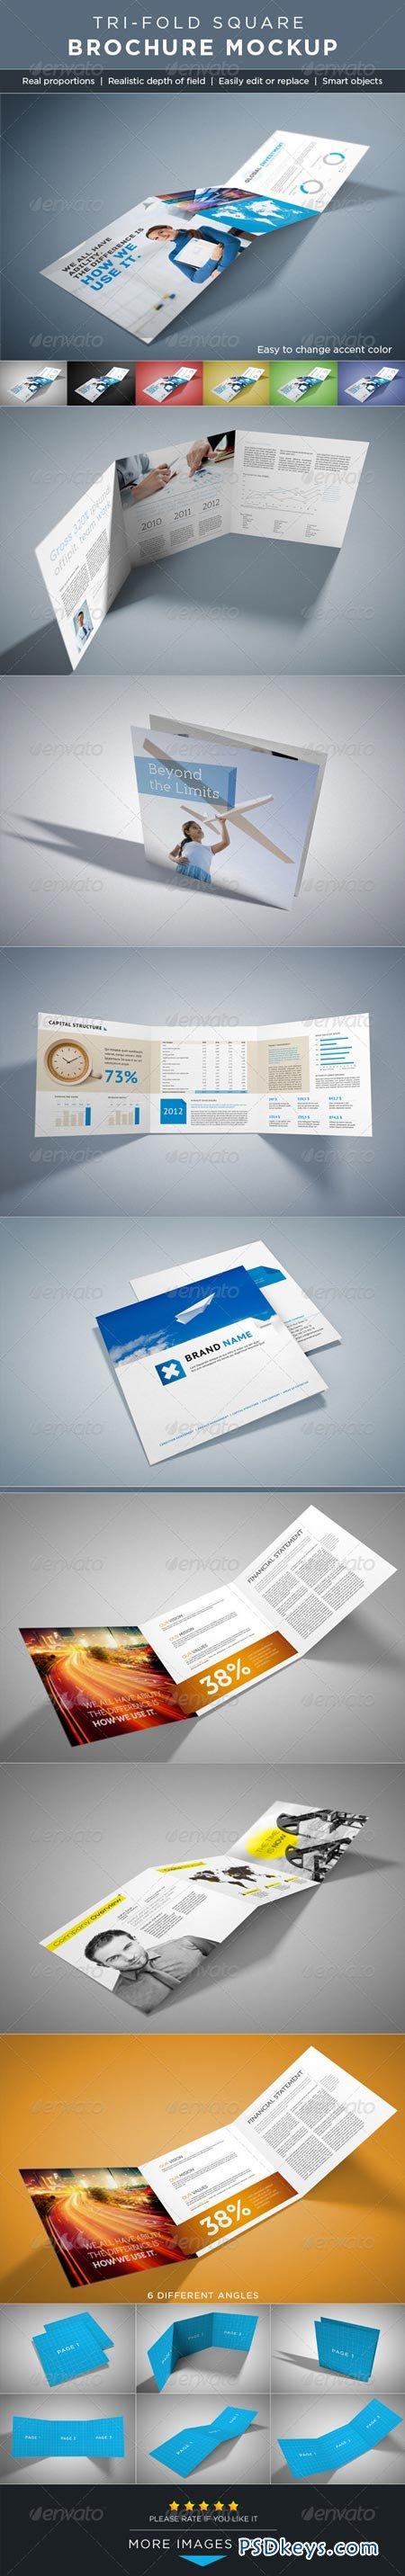 brochure mockup template - square tri fold brochure mock ups 2647523 free download